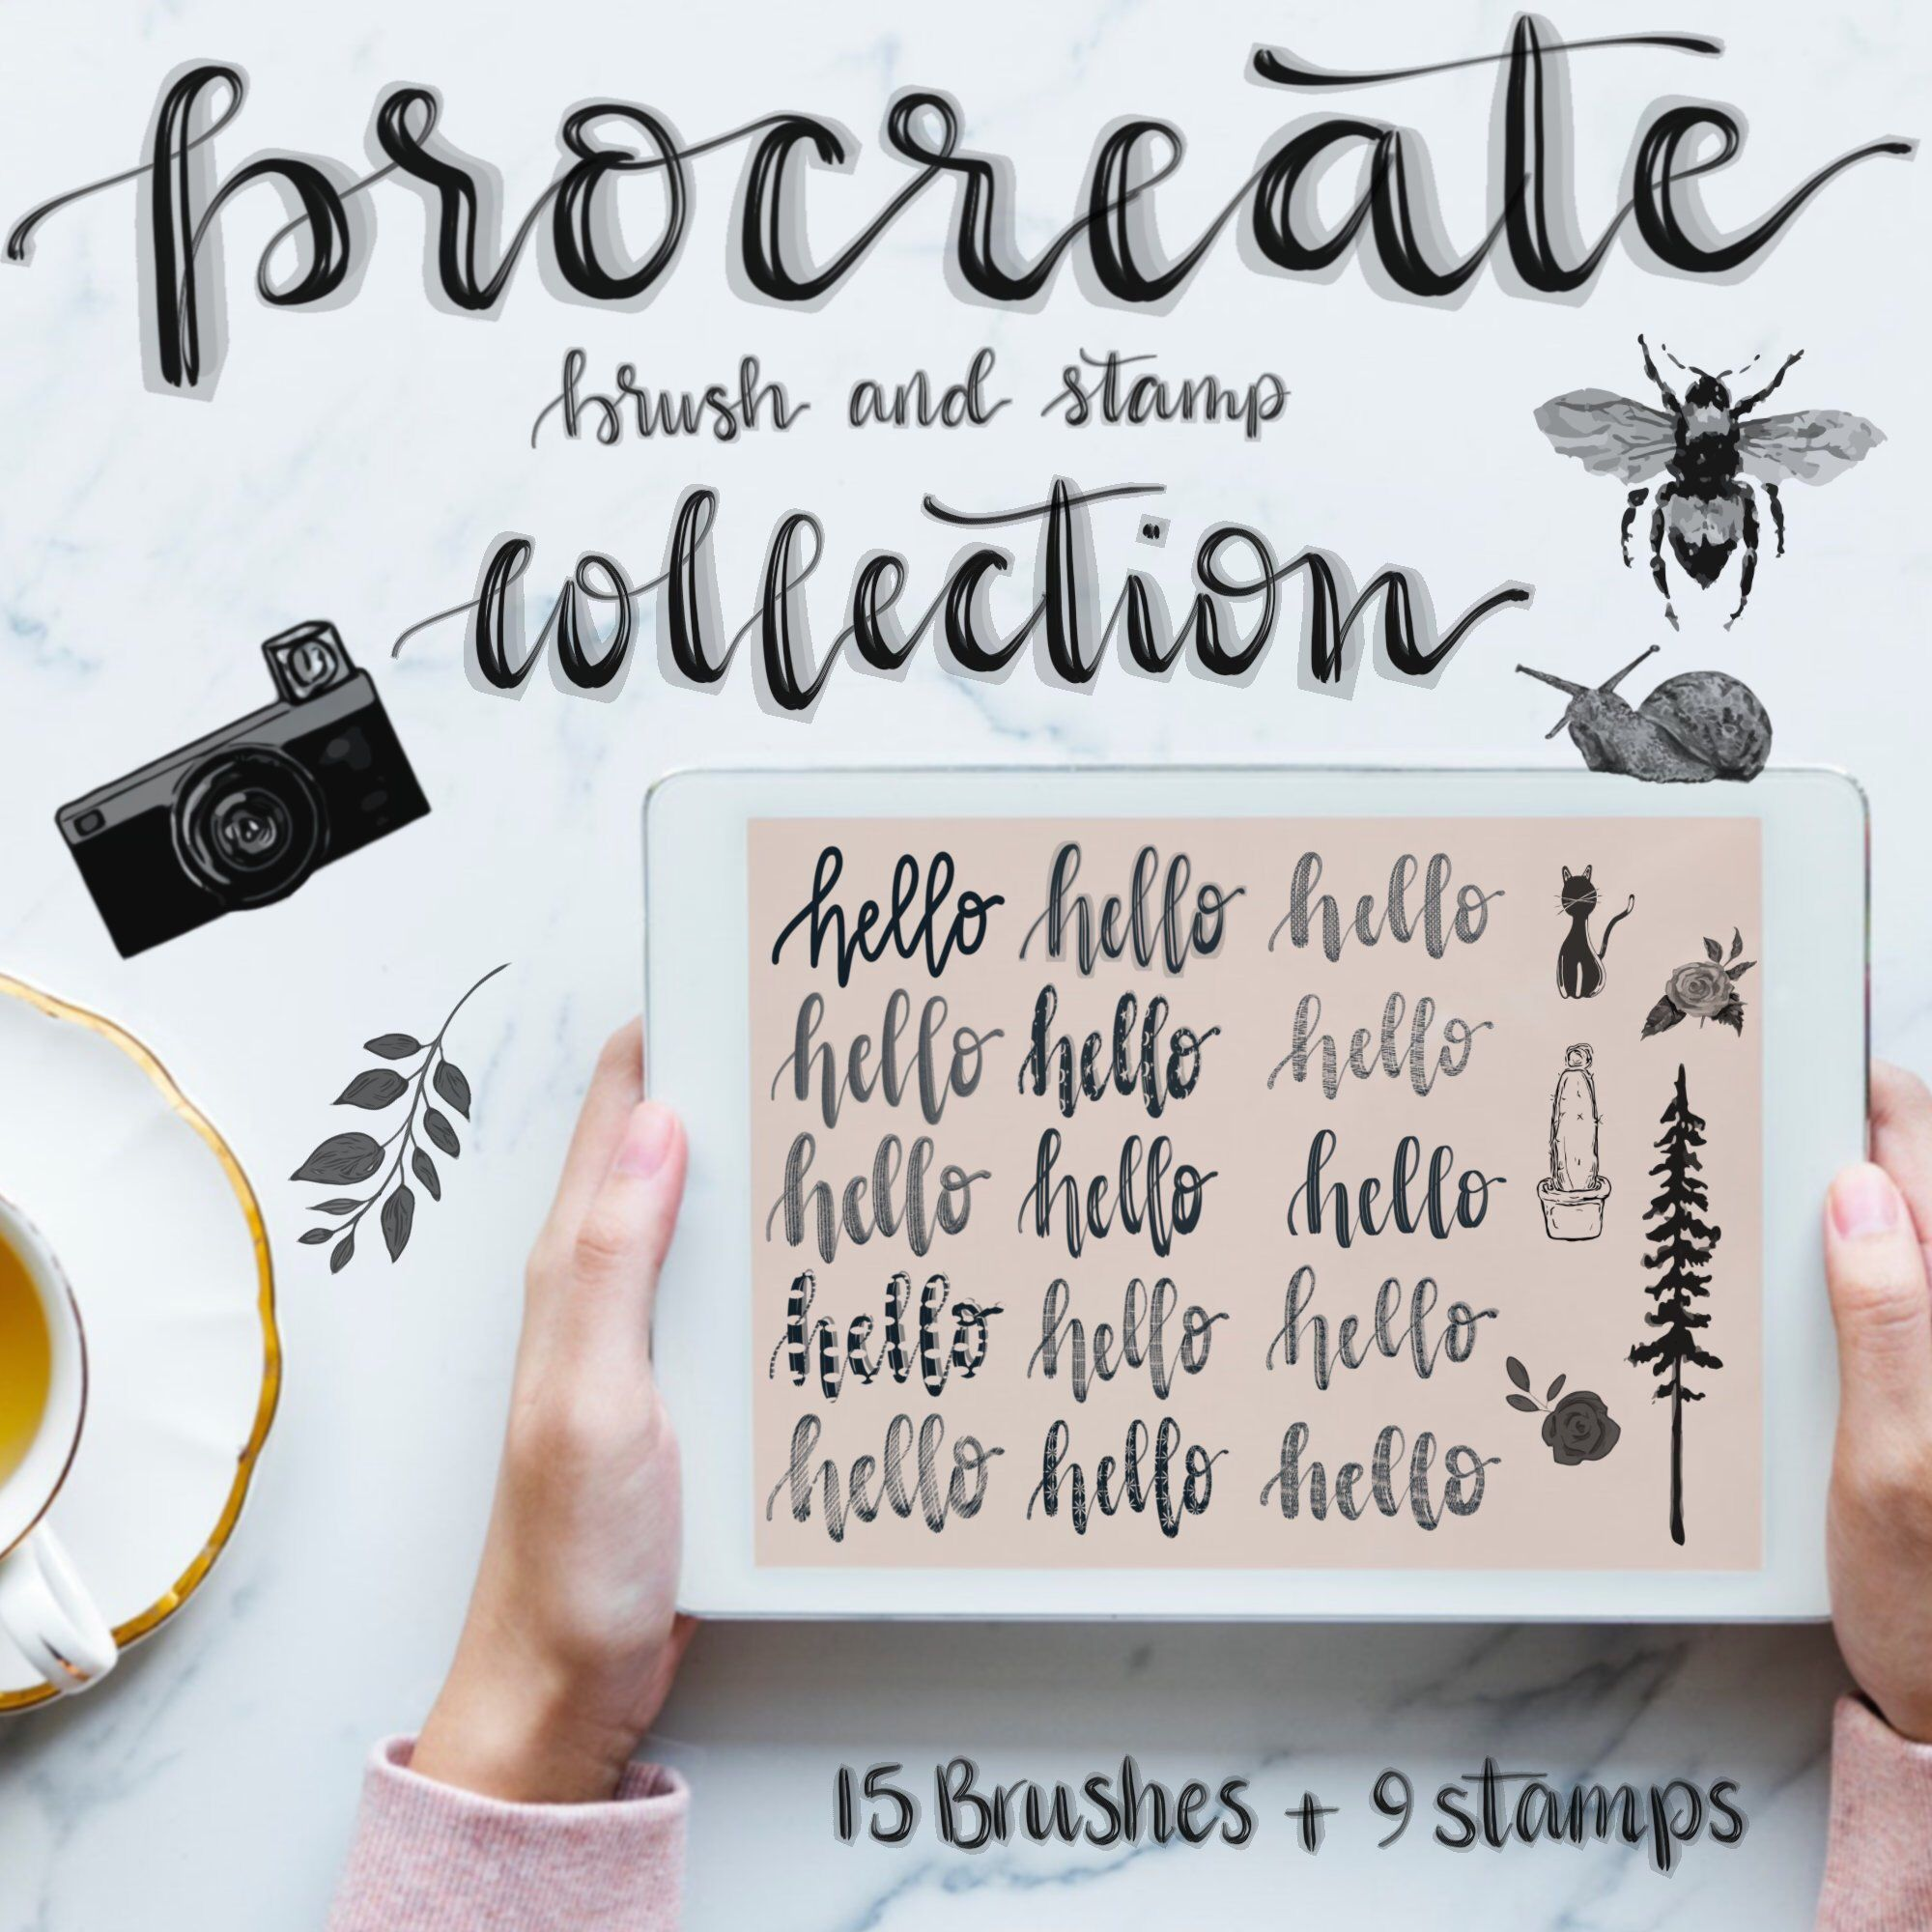 Procreate app brushes Ipad   digital calligraphy tools  | Etsy